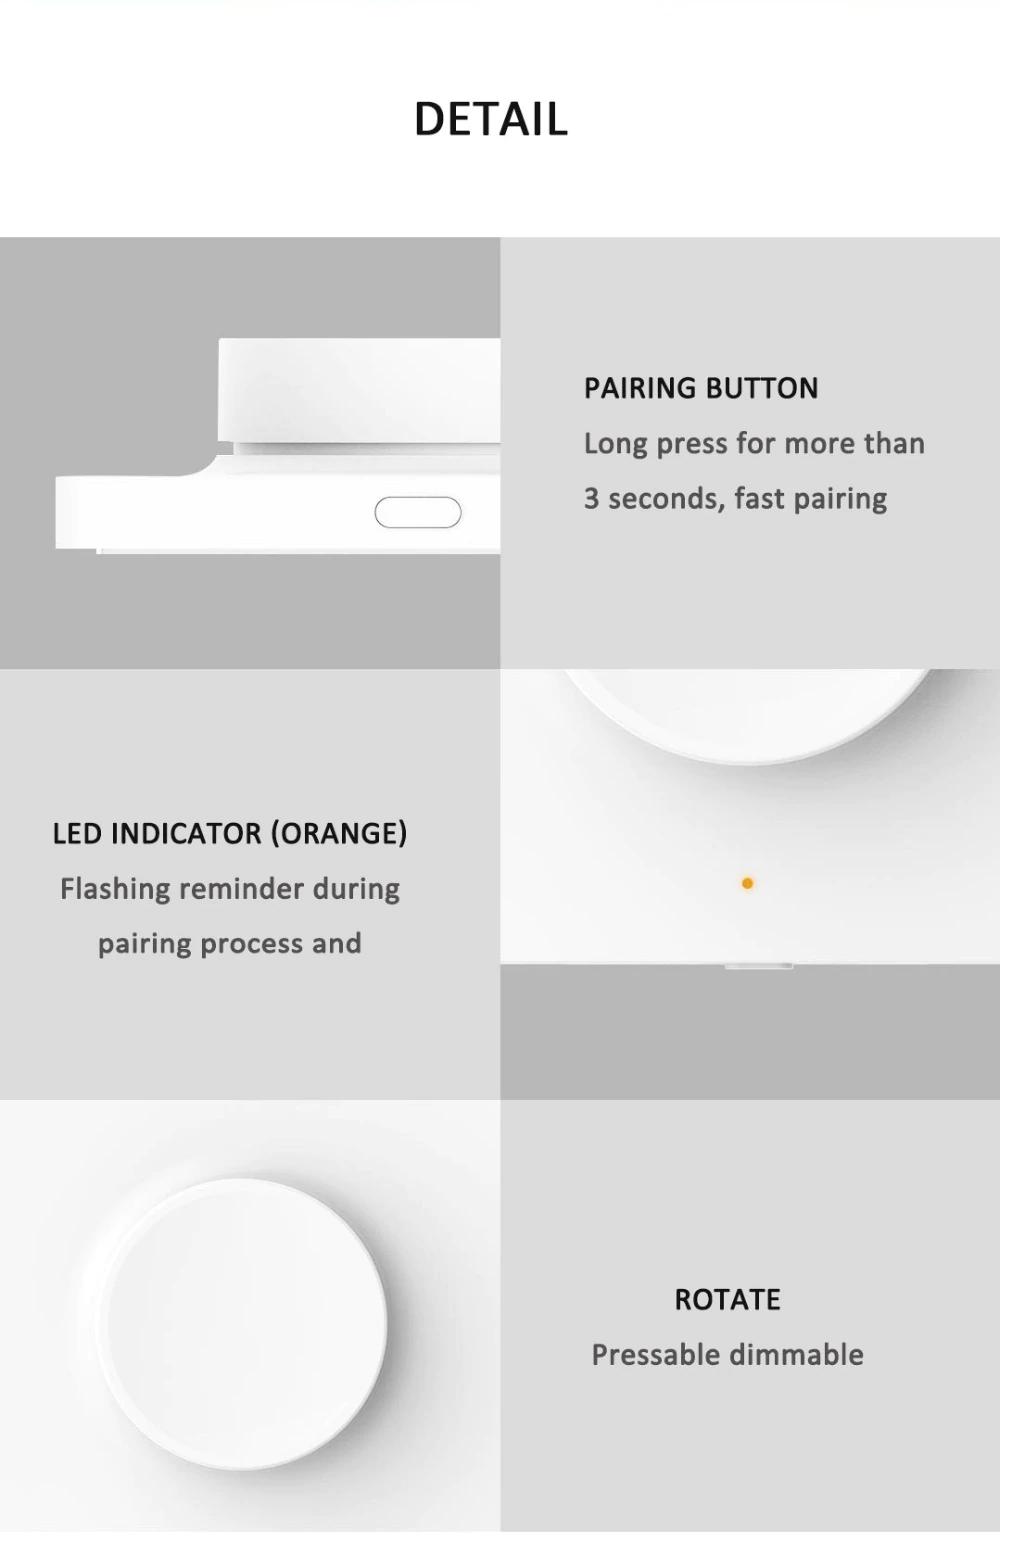 Xiaomi Yeelight Smart Dimmer Switch: ¿Cómo usarlo?